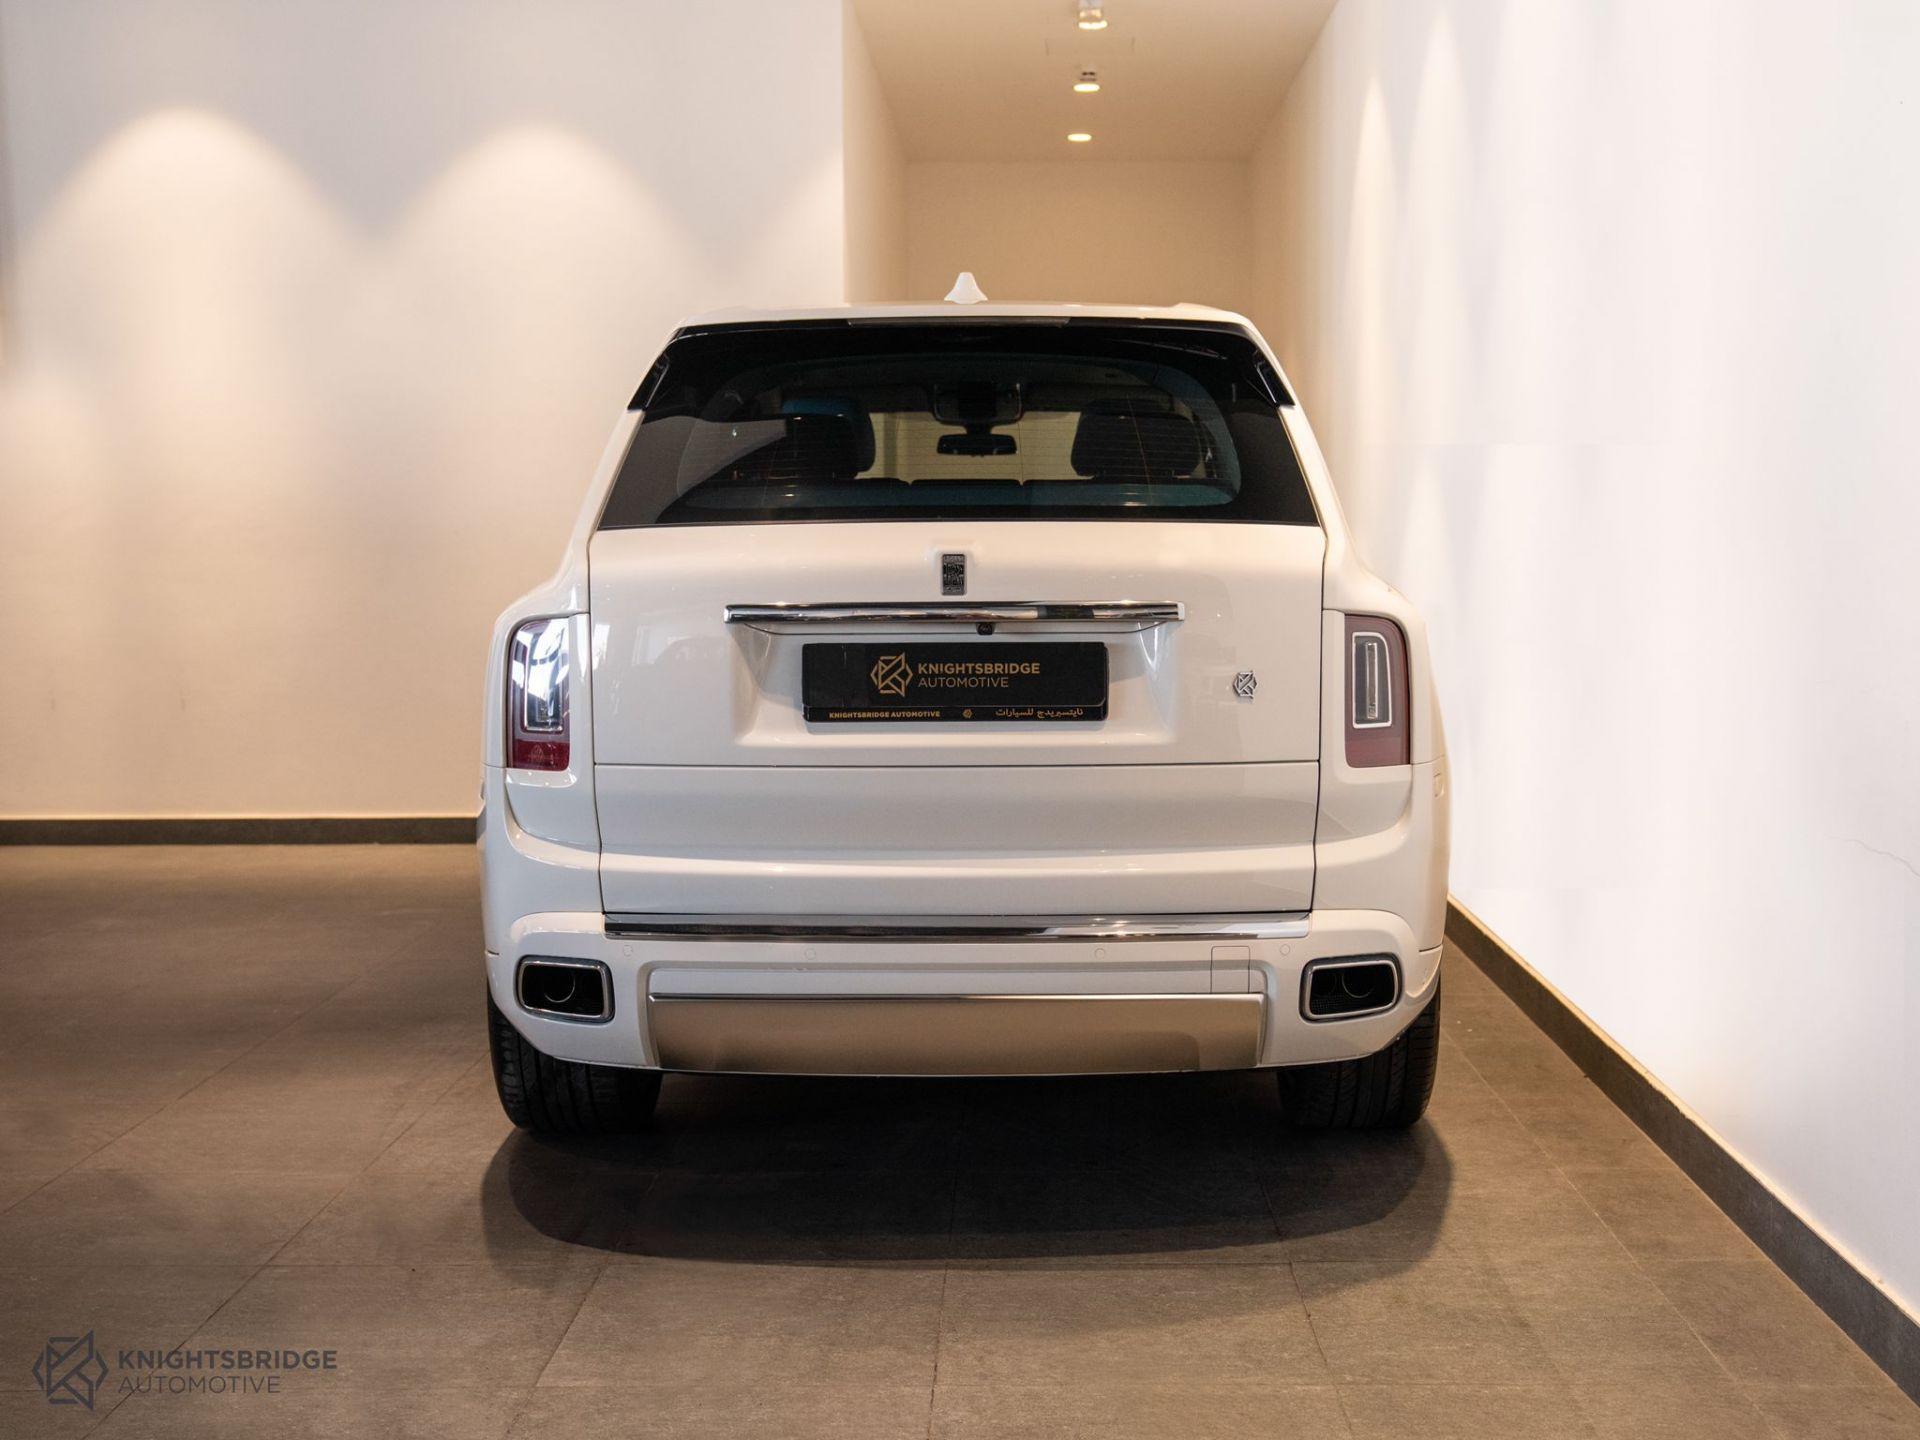 2021 Rolls-Royce Cullinan at Knightsbridge Automotive - (10061 - 5)